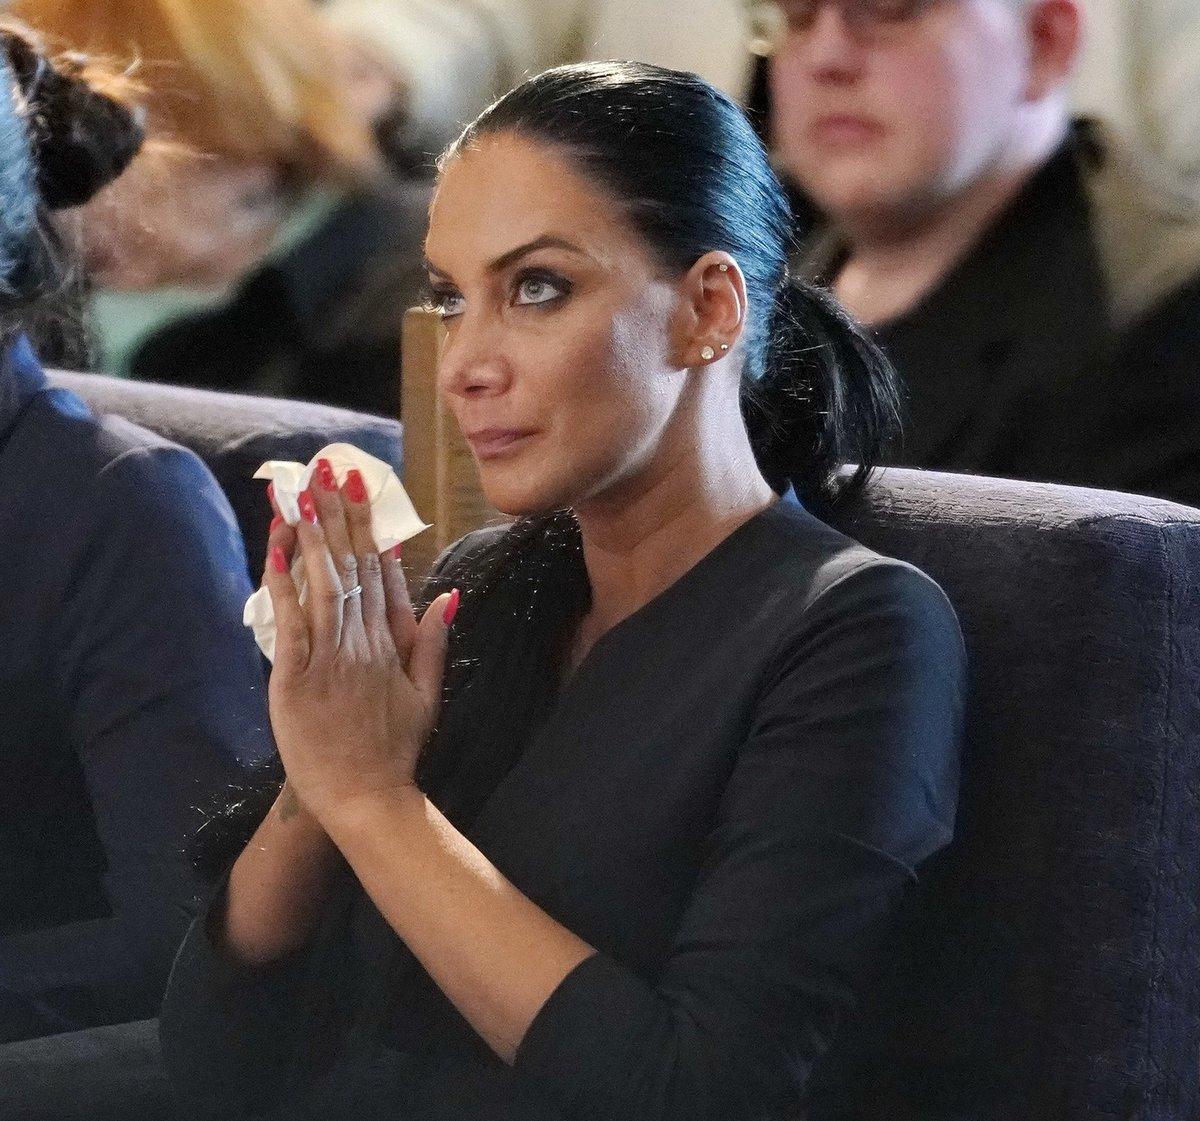 Vdova Andrea Pomeje na pohřbu